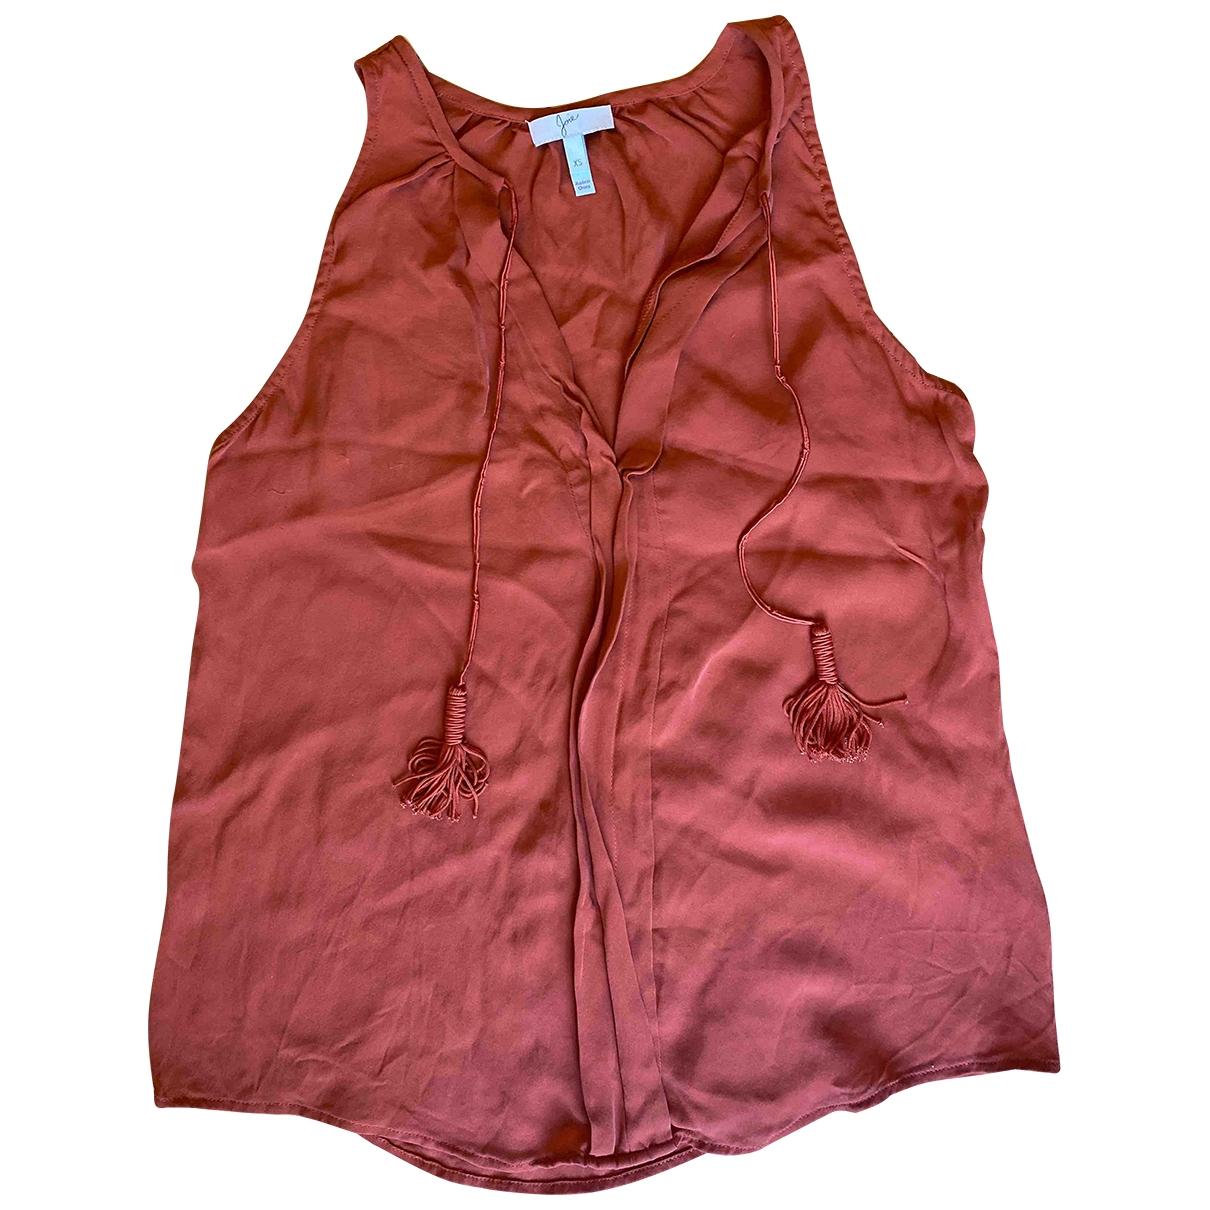 Joie \N Orange Silk  top for Women XS International